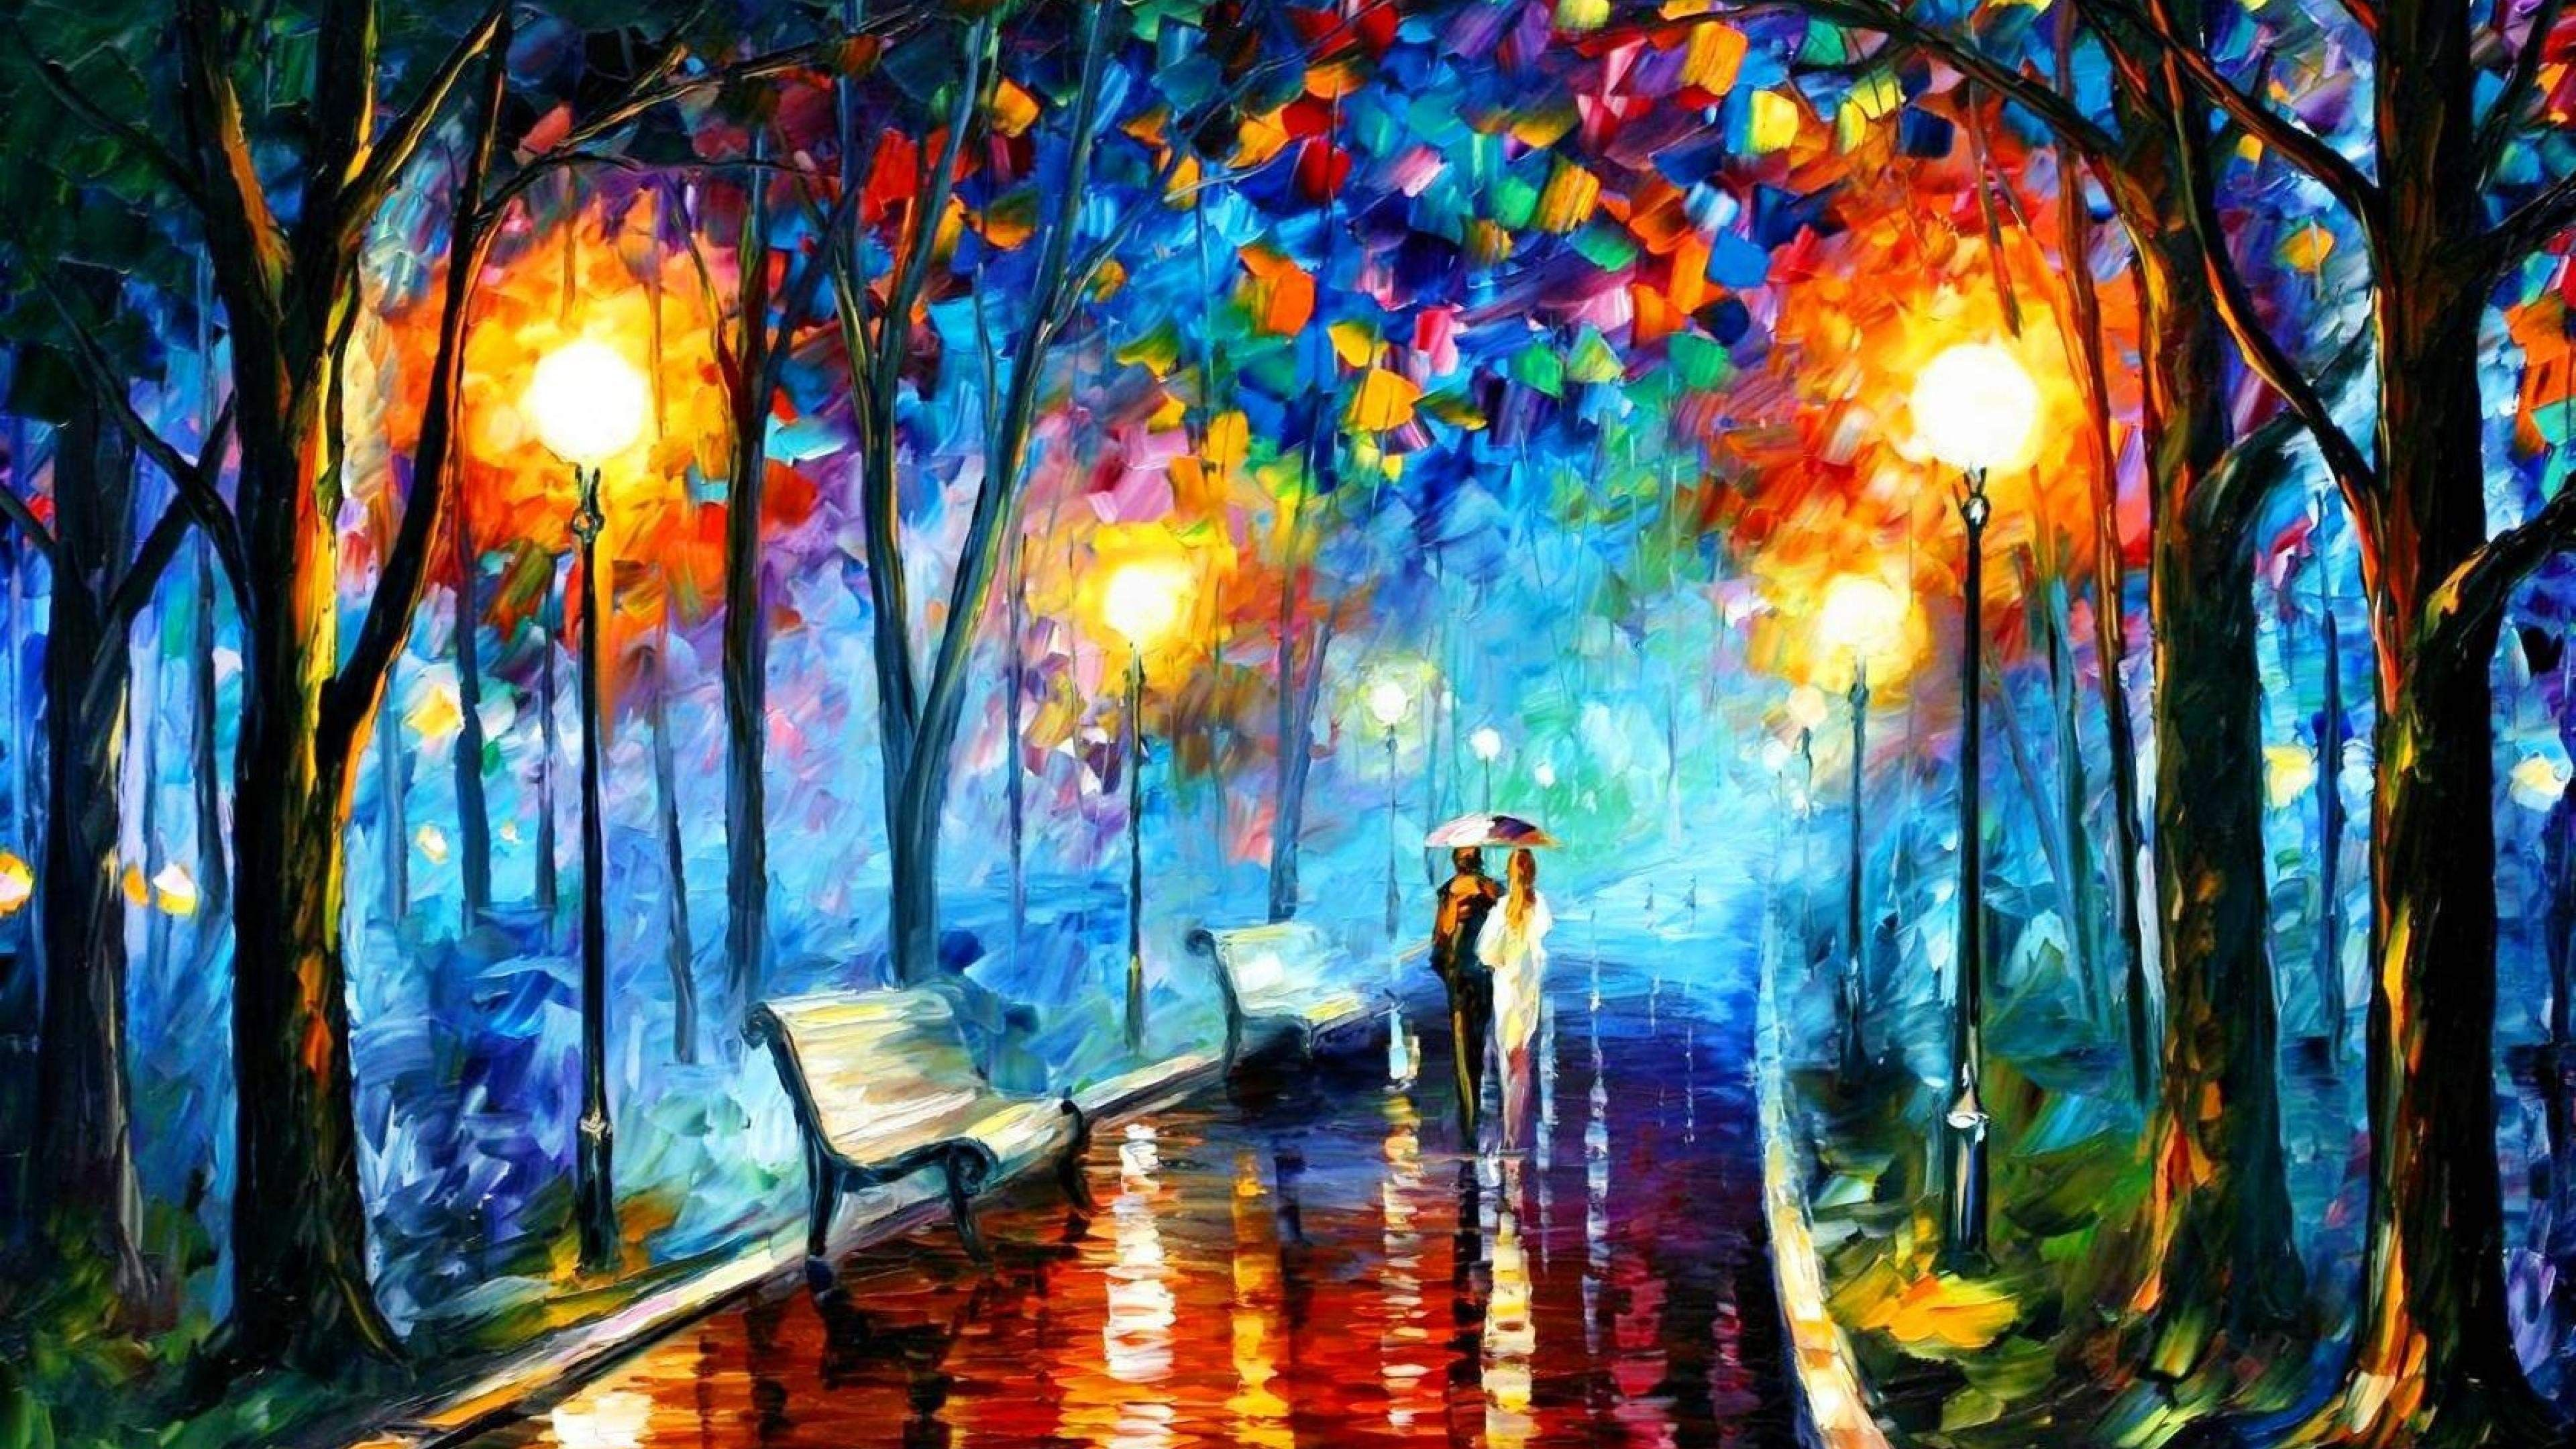 Couple Painting Art 4k Ultra Hd Wallpaper